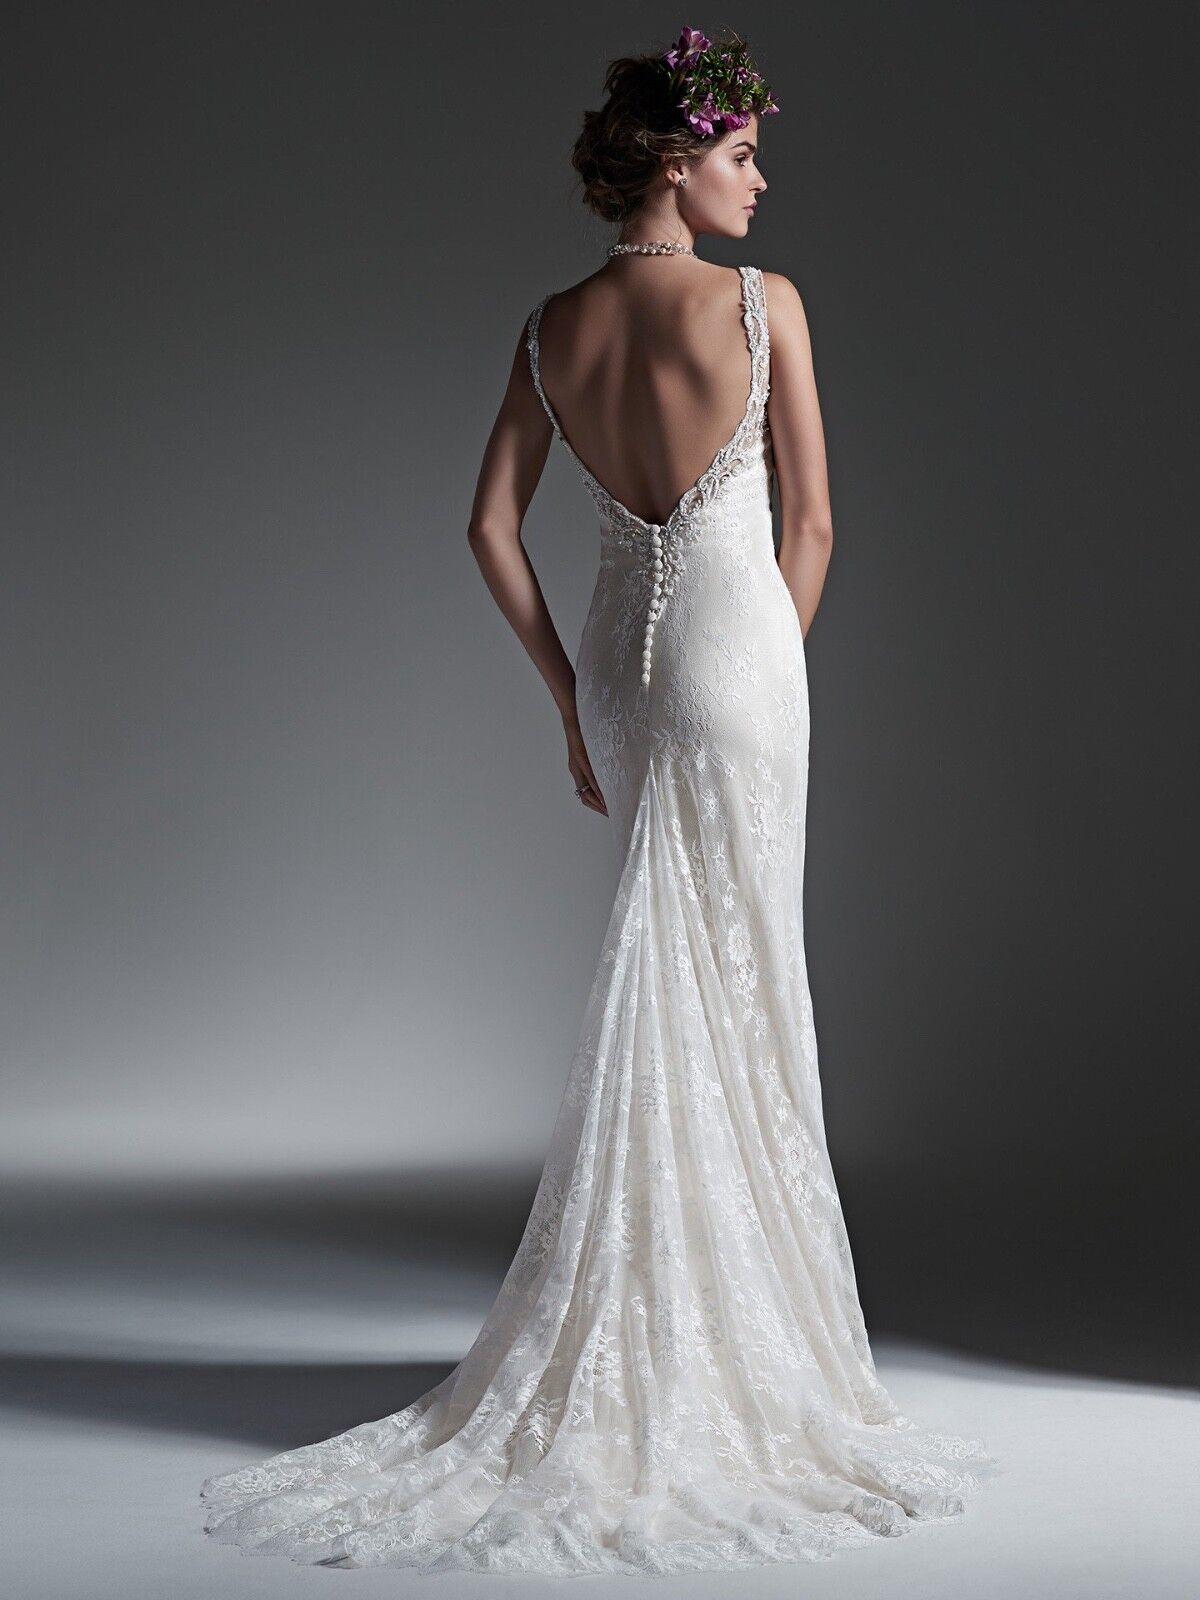 PERRI BY SOTTERO AND MIDGLEY WEDDING DRESS SIZE 12